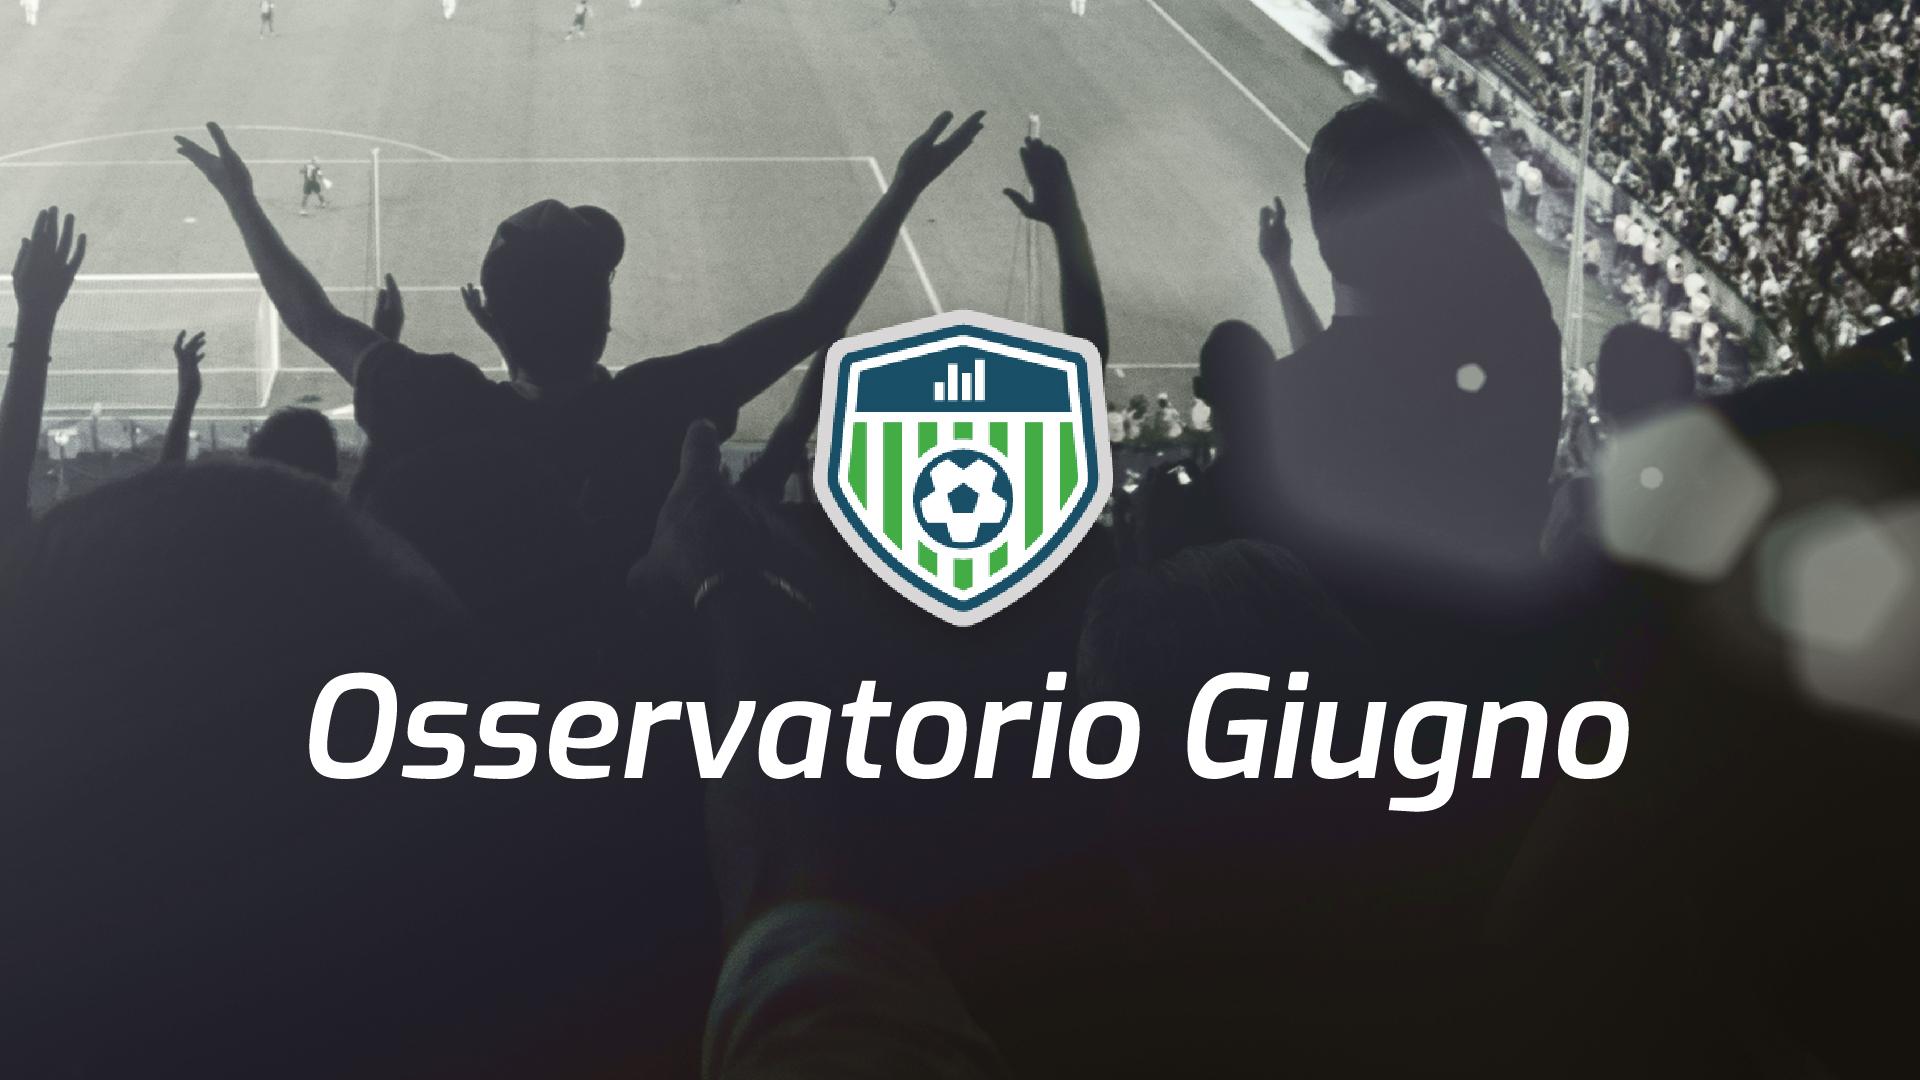 Osservatorio Giugno Social Media Soccer